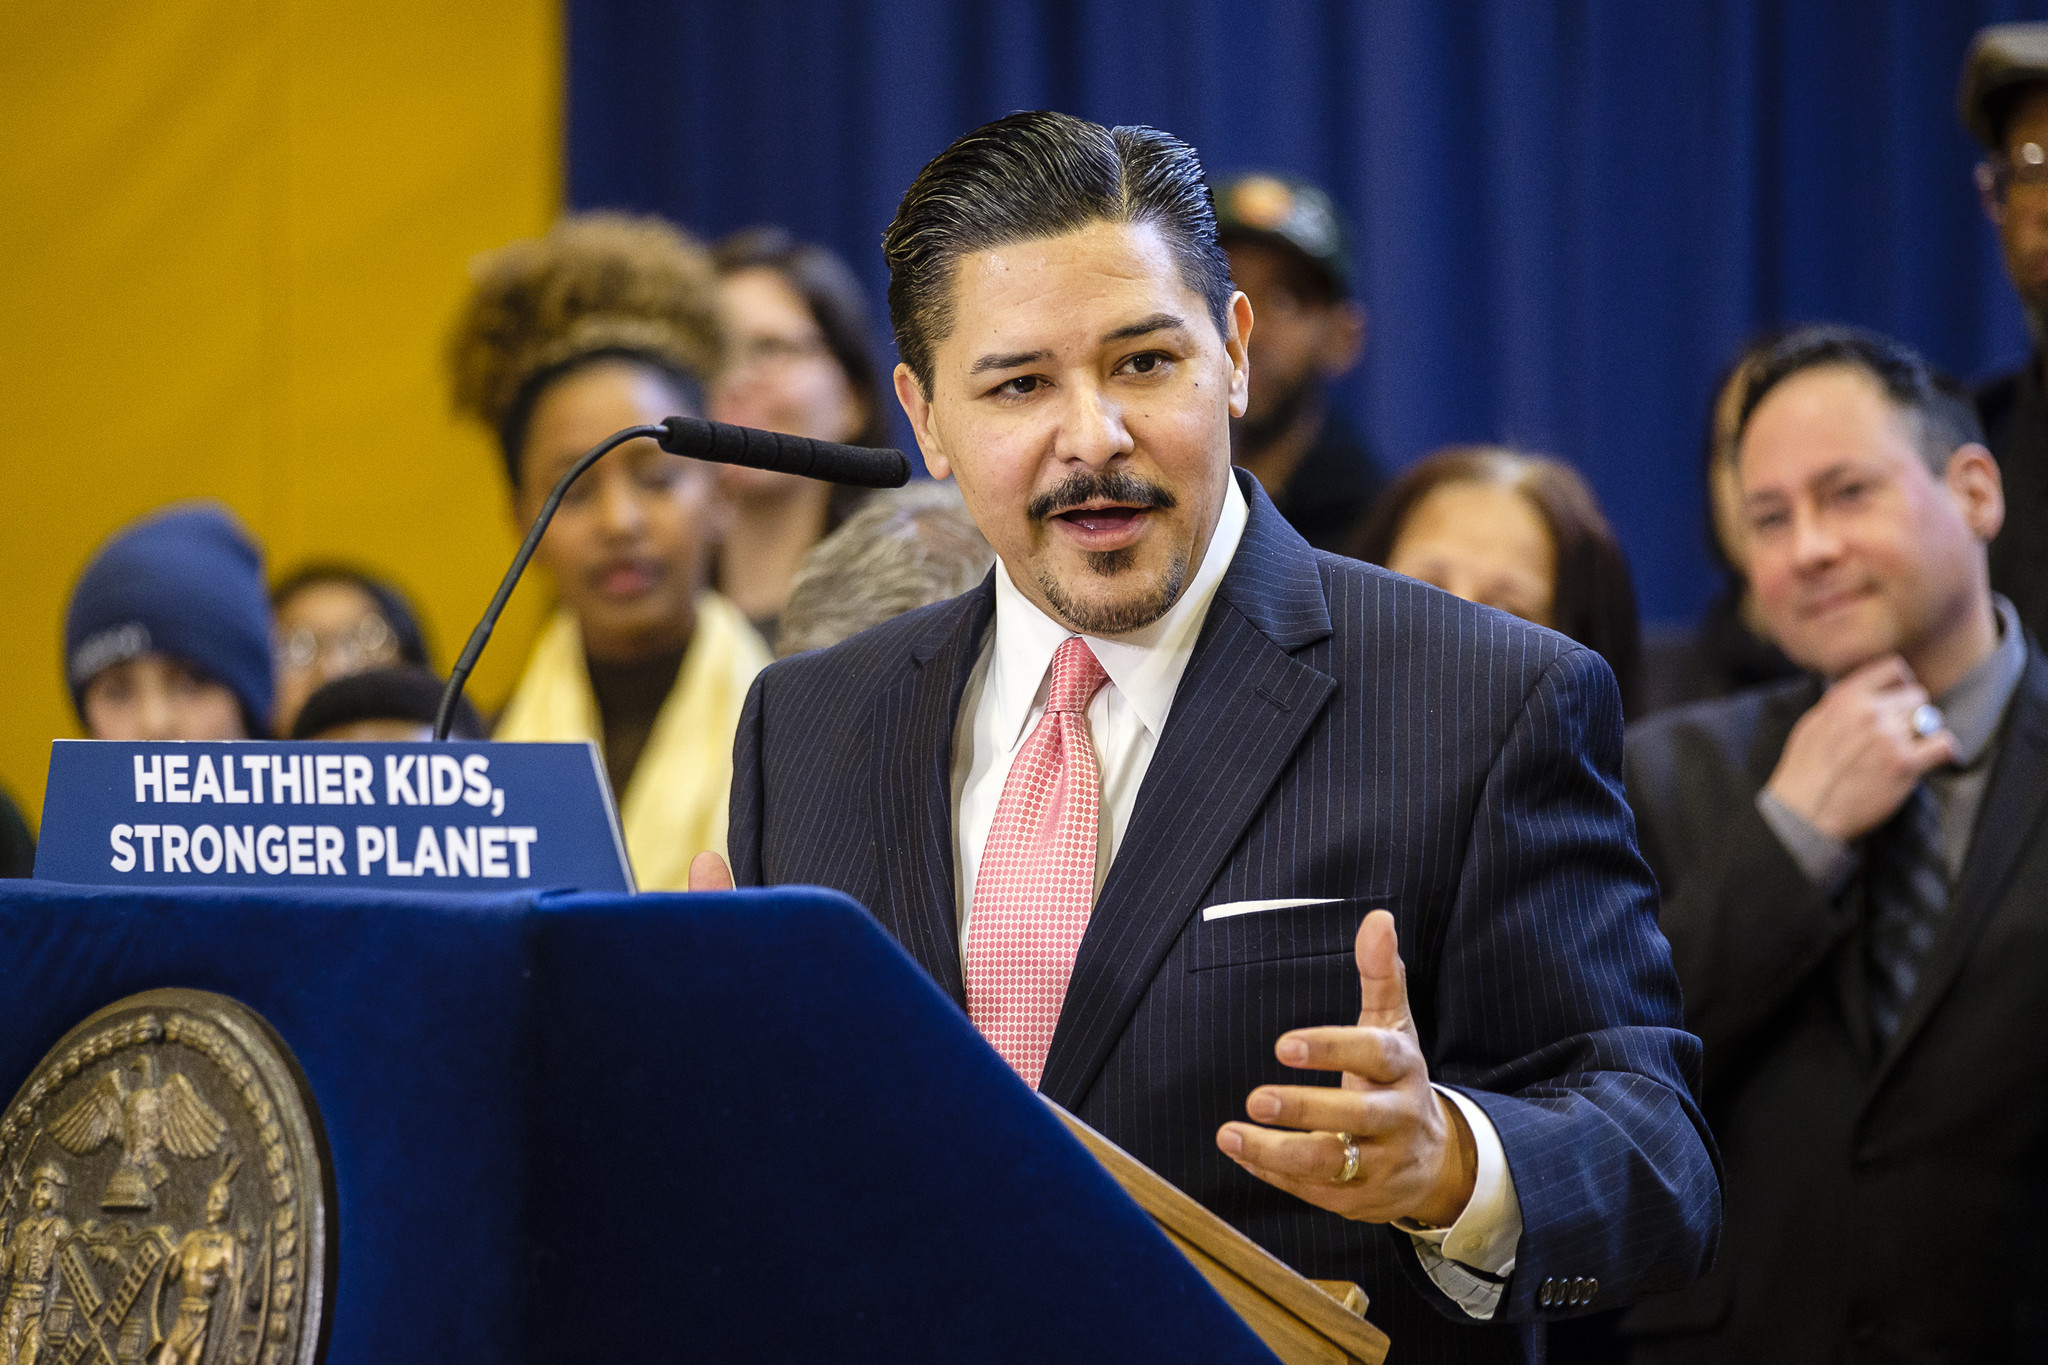 NYC schools chancellor slams critics over abrupt ending to Queens school town hall, calling it a 'set up'